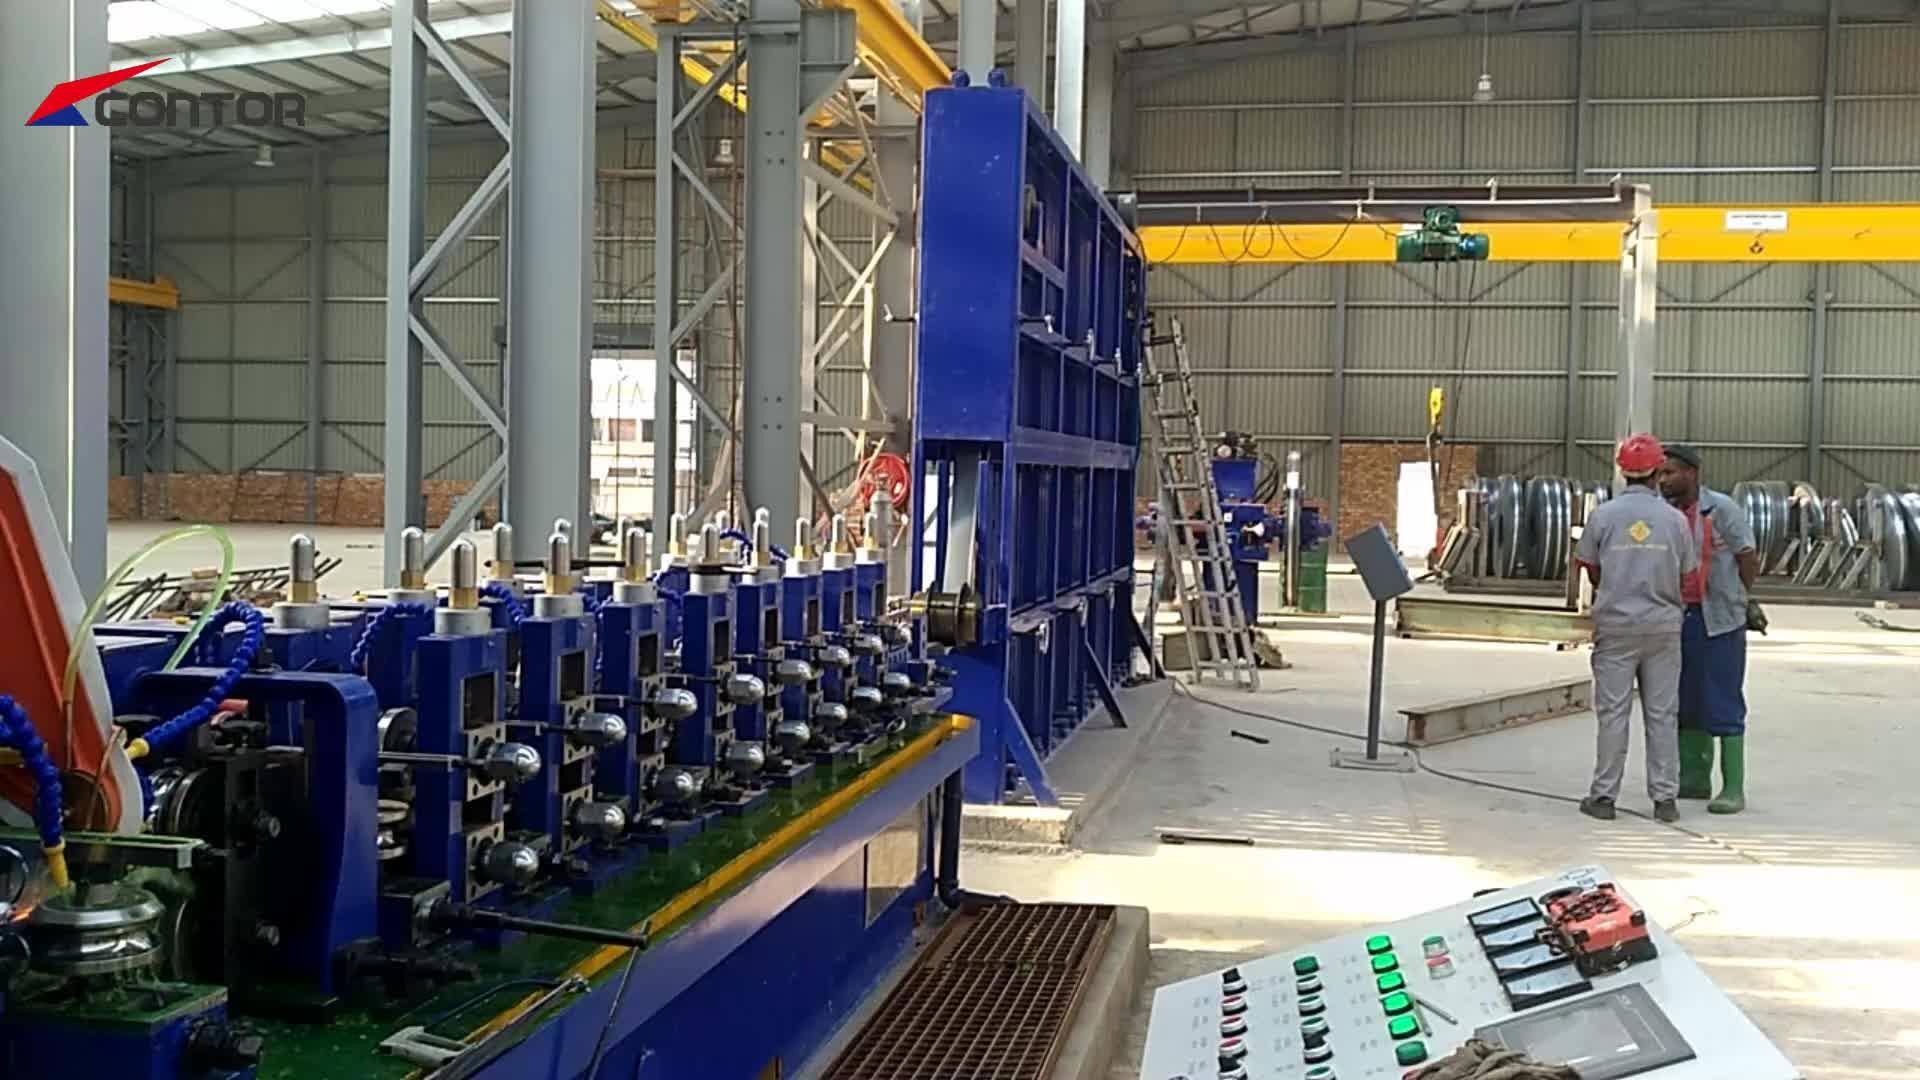 Metal kesme dairesel testere tüp kesme makinesi otomatik boru fabrikası uçan kesim testere